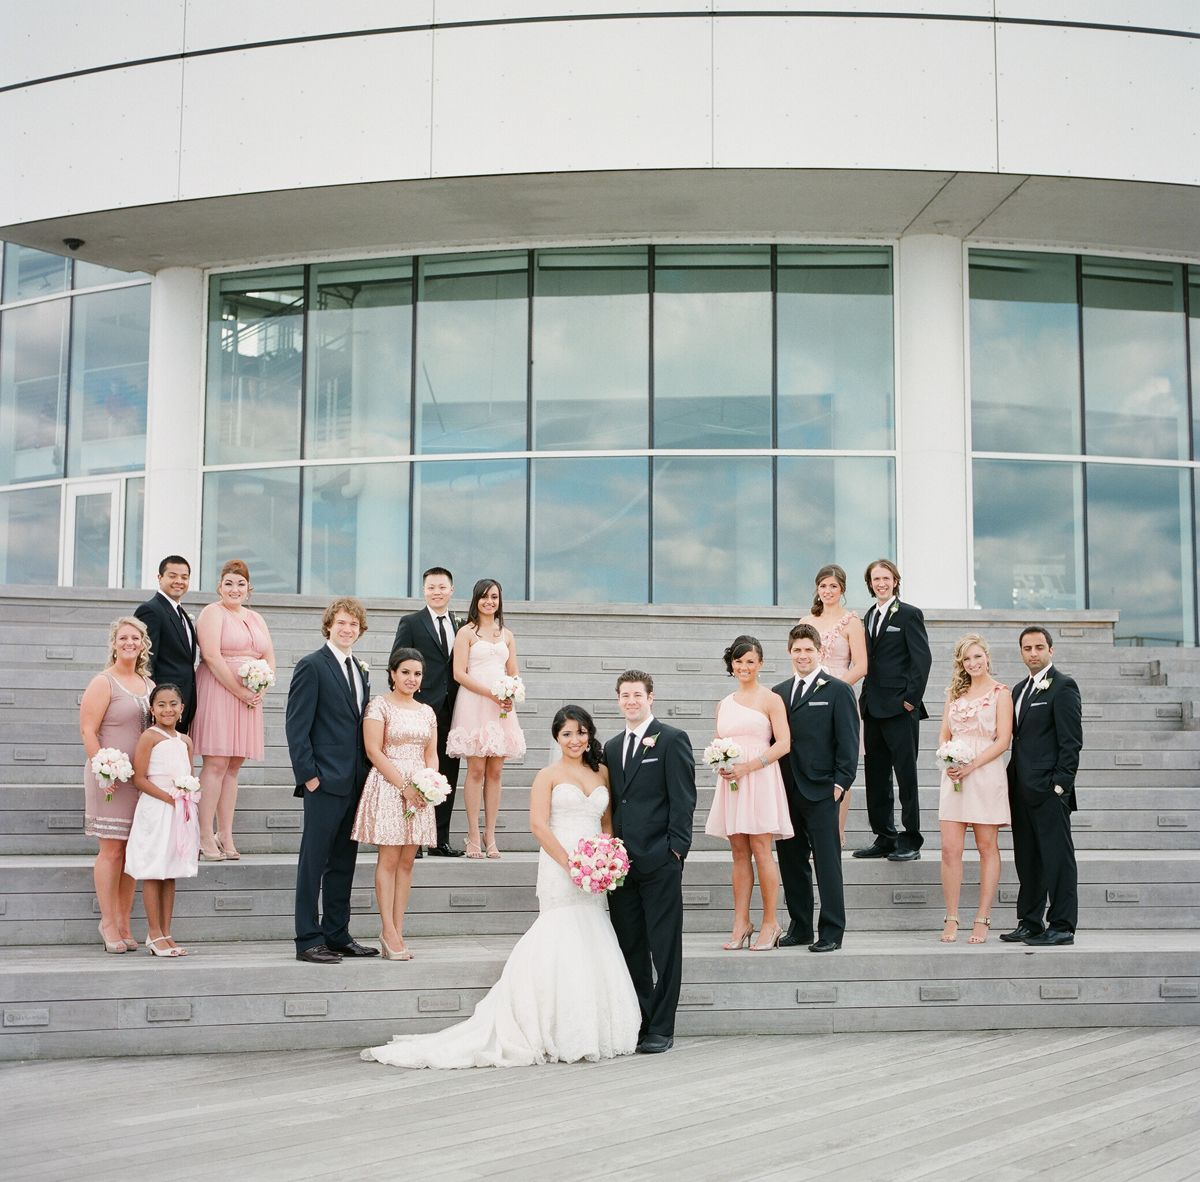 PIER WISCONSIN MILWAUKEE WEDDING | Wisconsin, Blush color palette ...